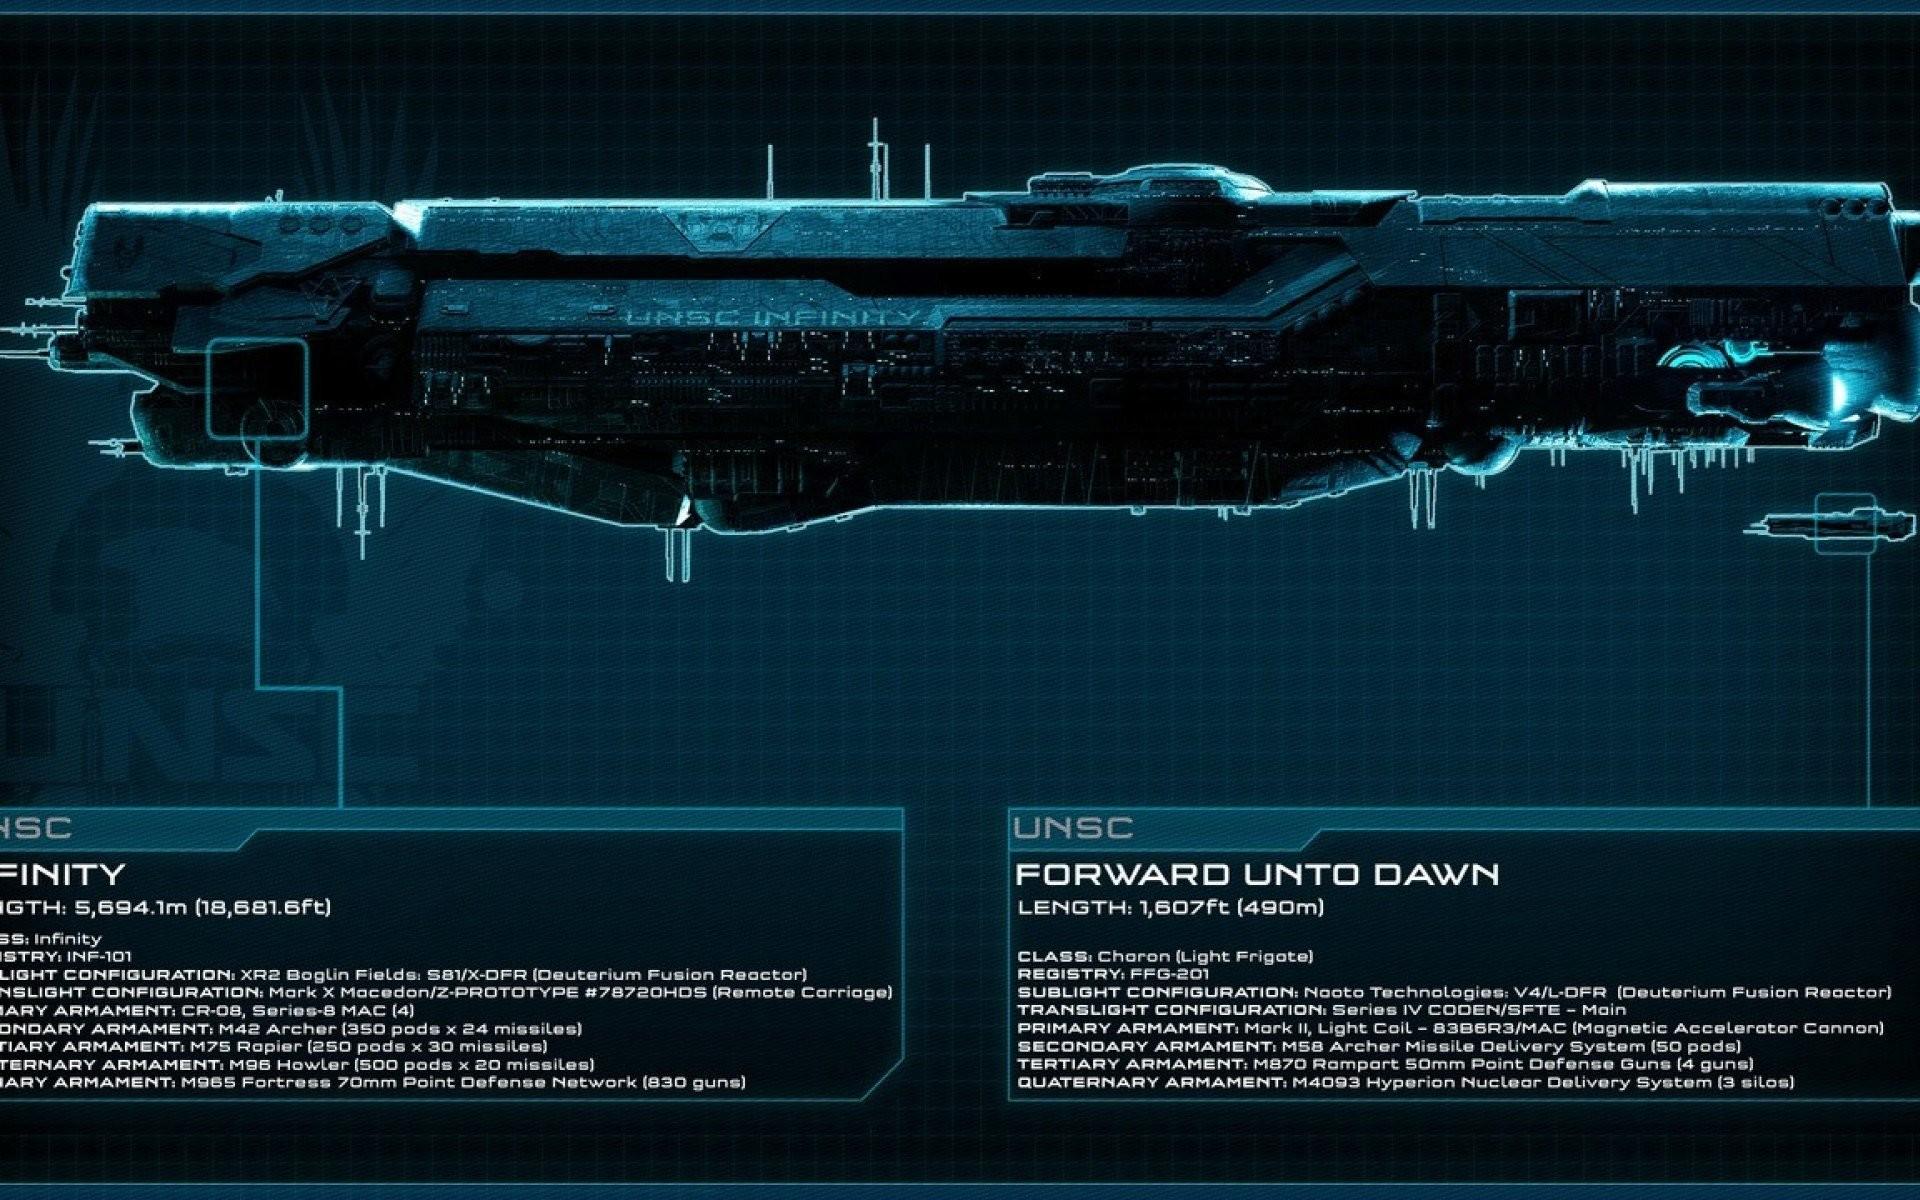 Unsc Infinity · unsc frigate